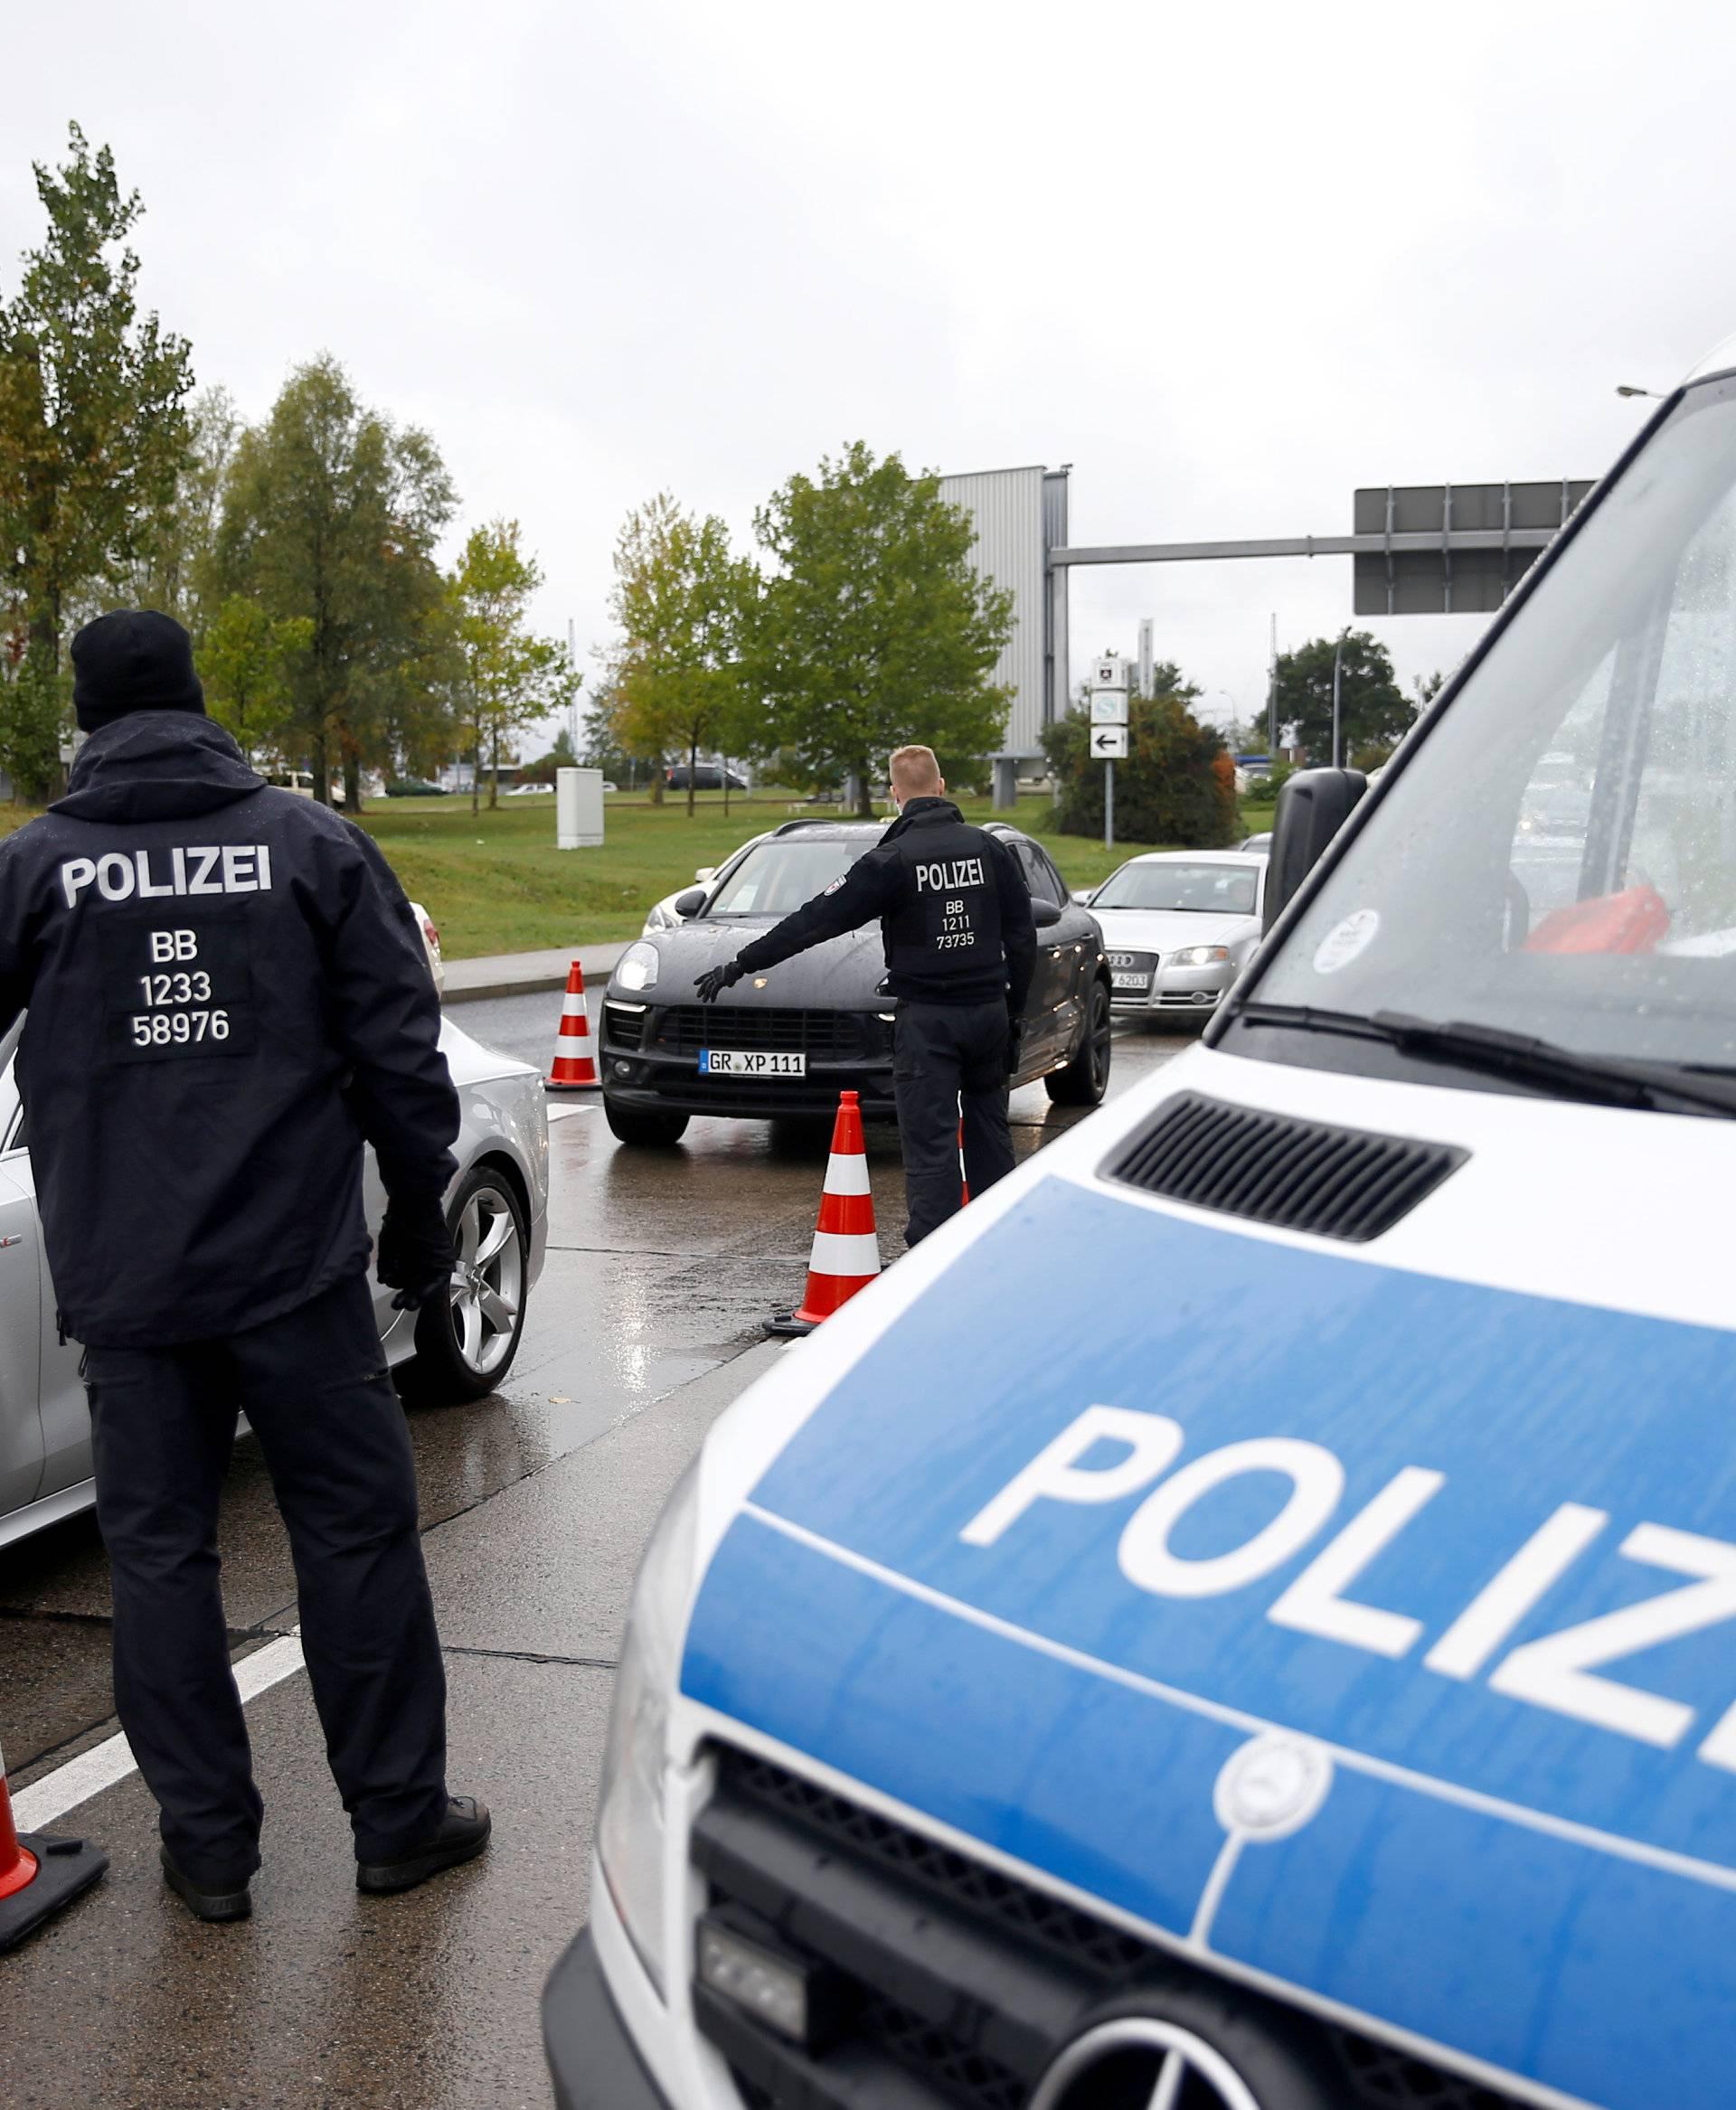 German policemen check cars on the entrance to Berlin-Schoenefeld airport, in Schoenefeld